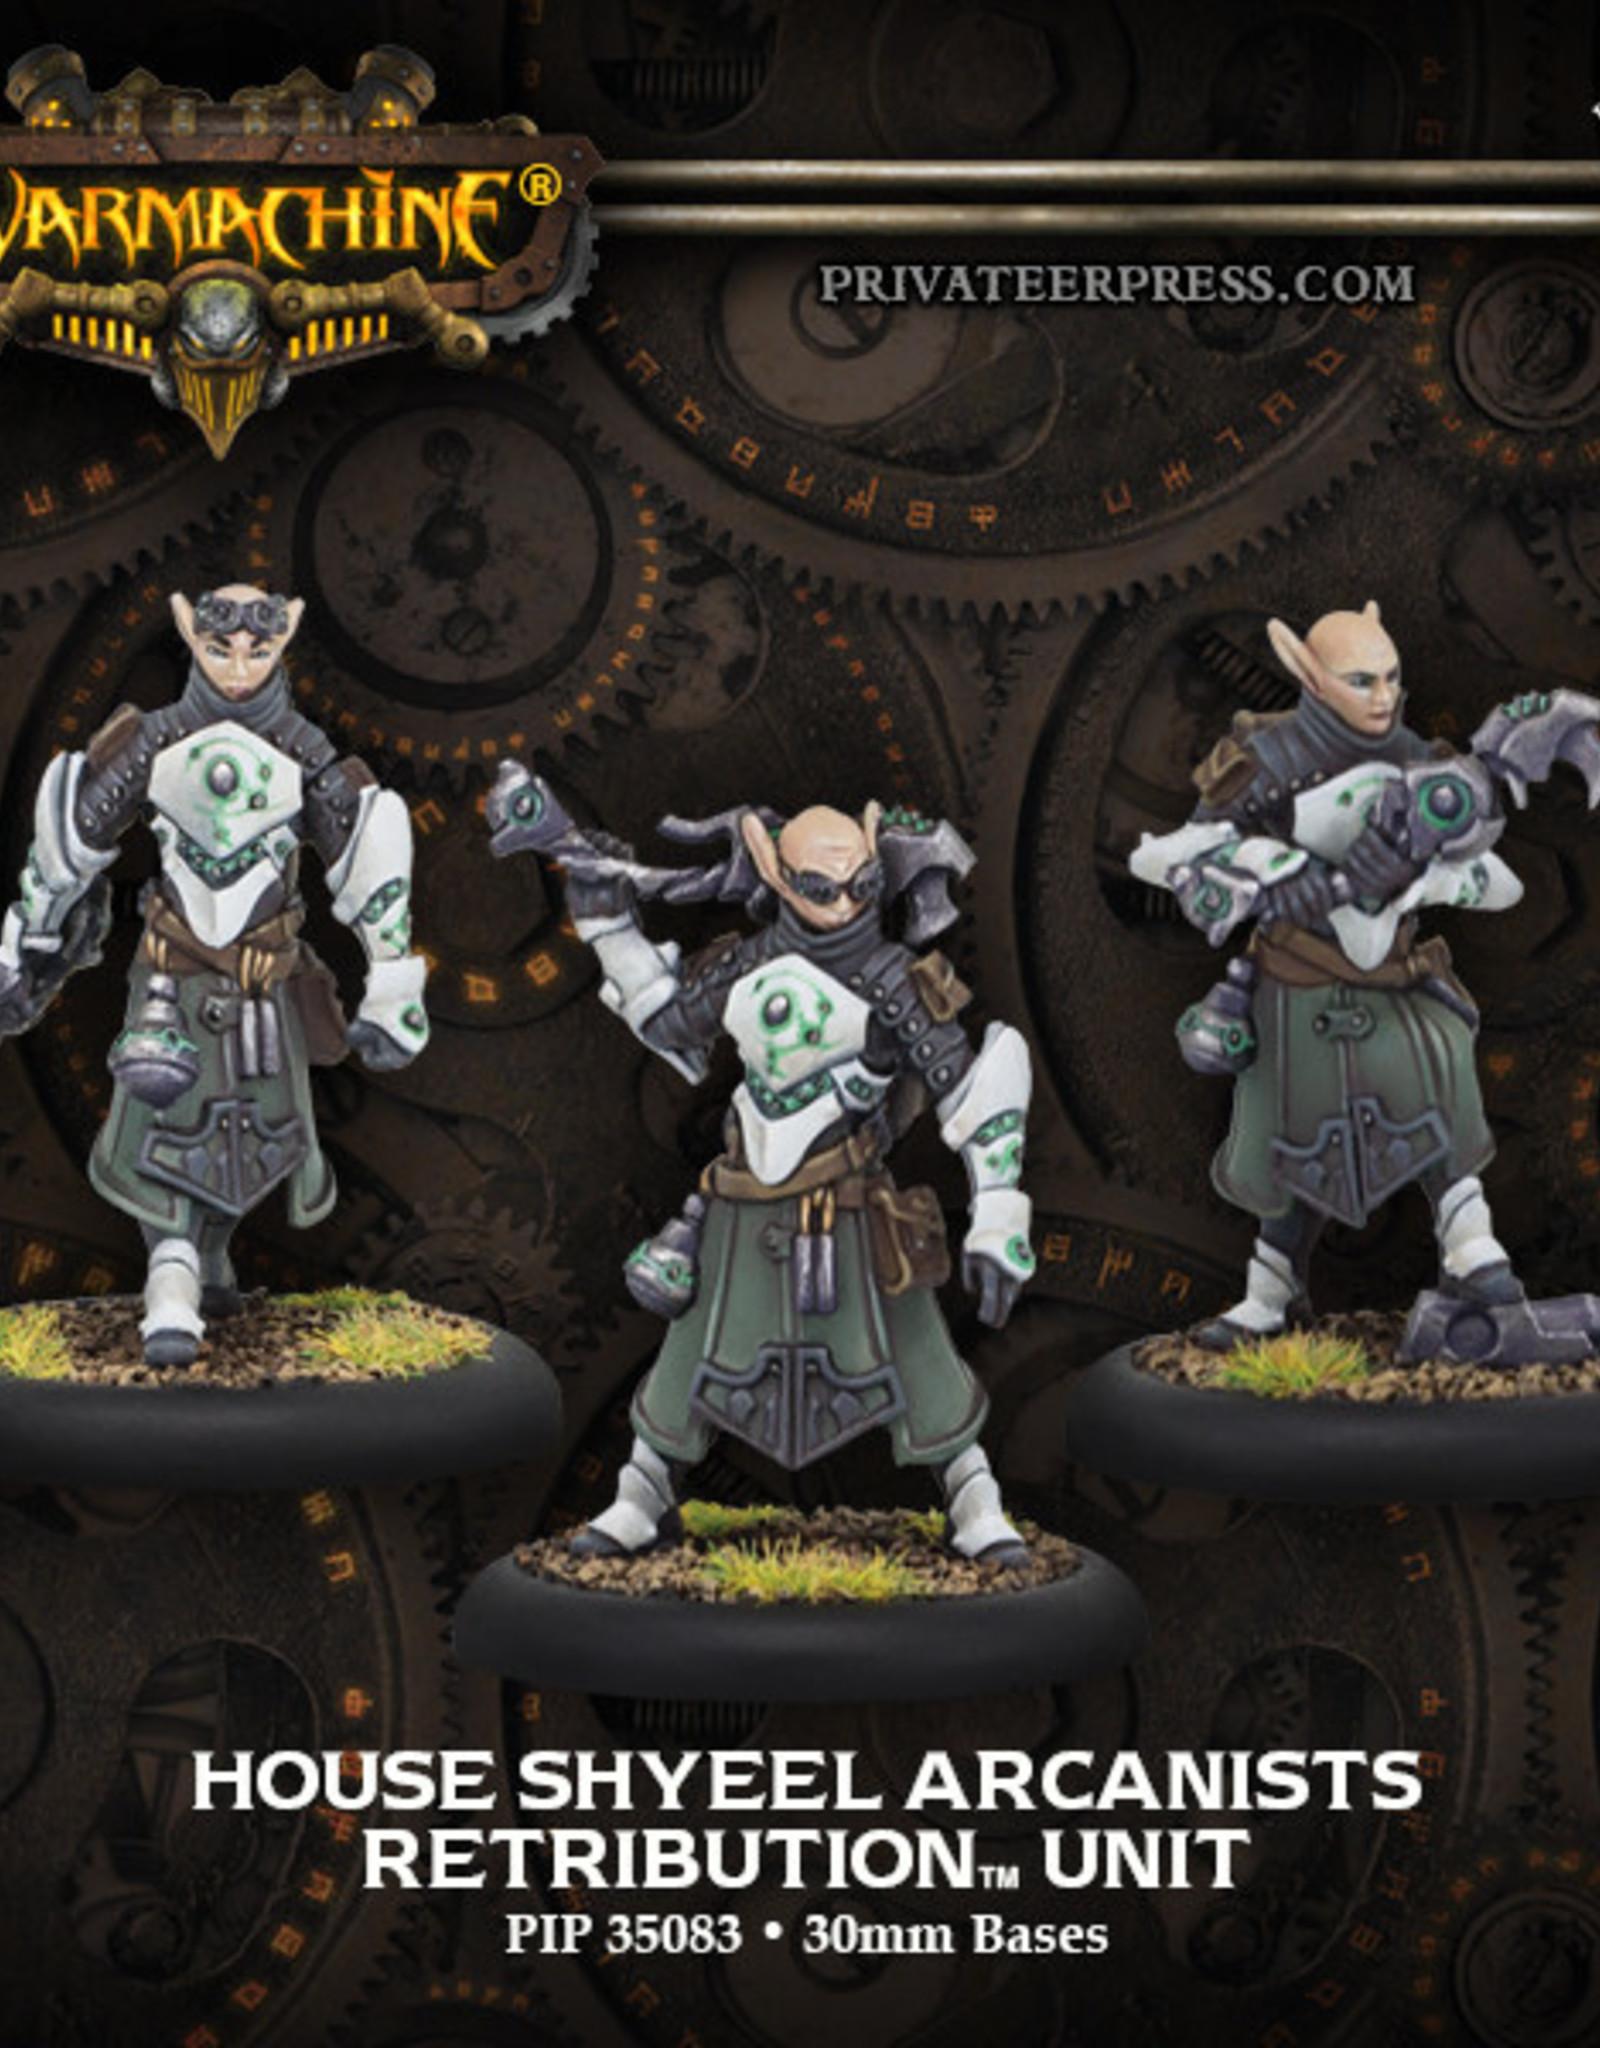 Warmachine Scyrah - House Shyeel Arcanists